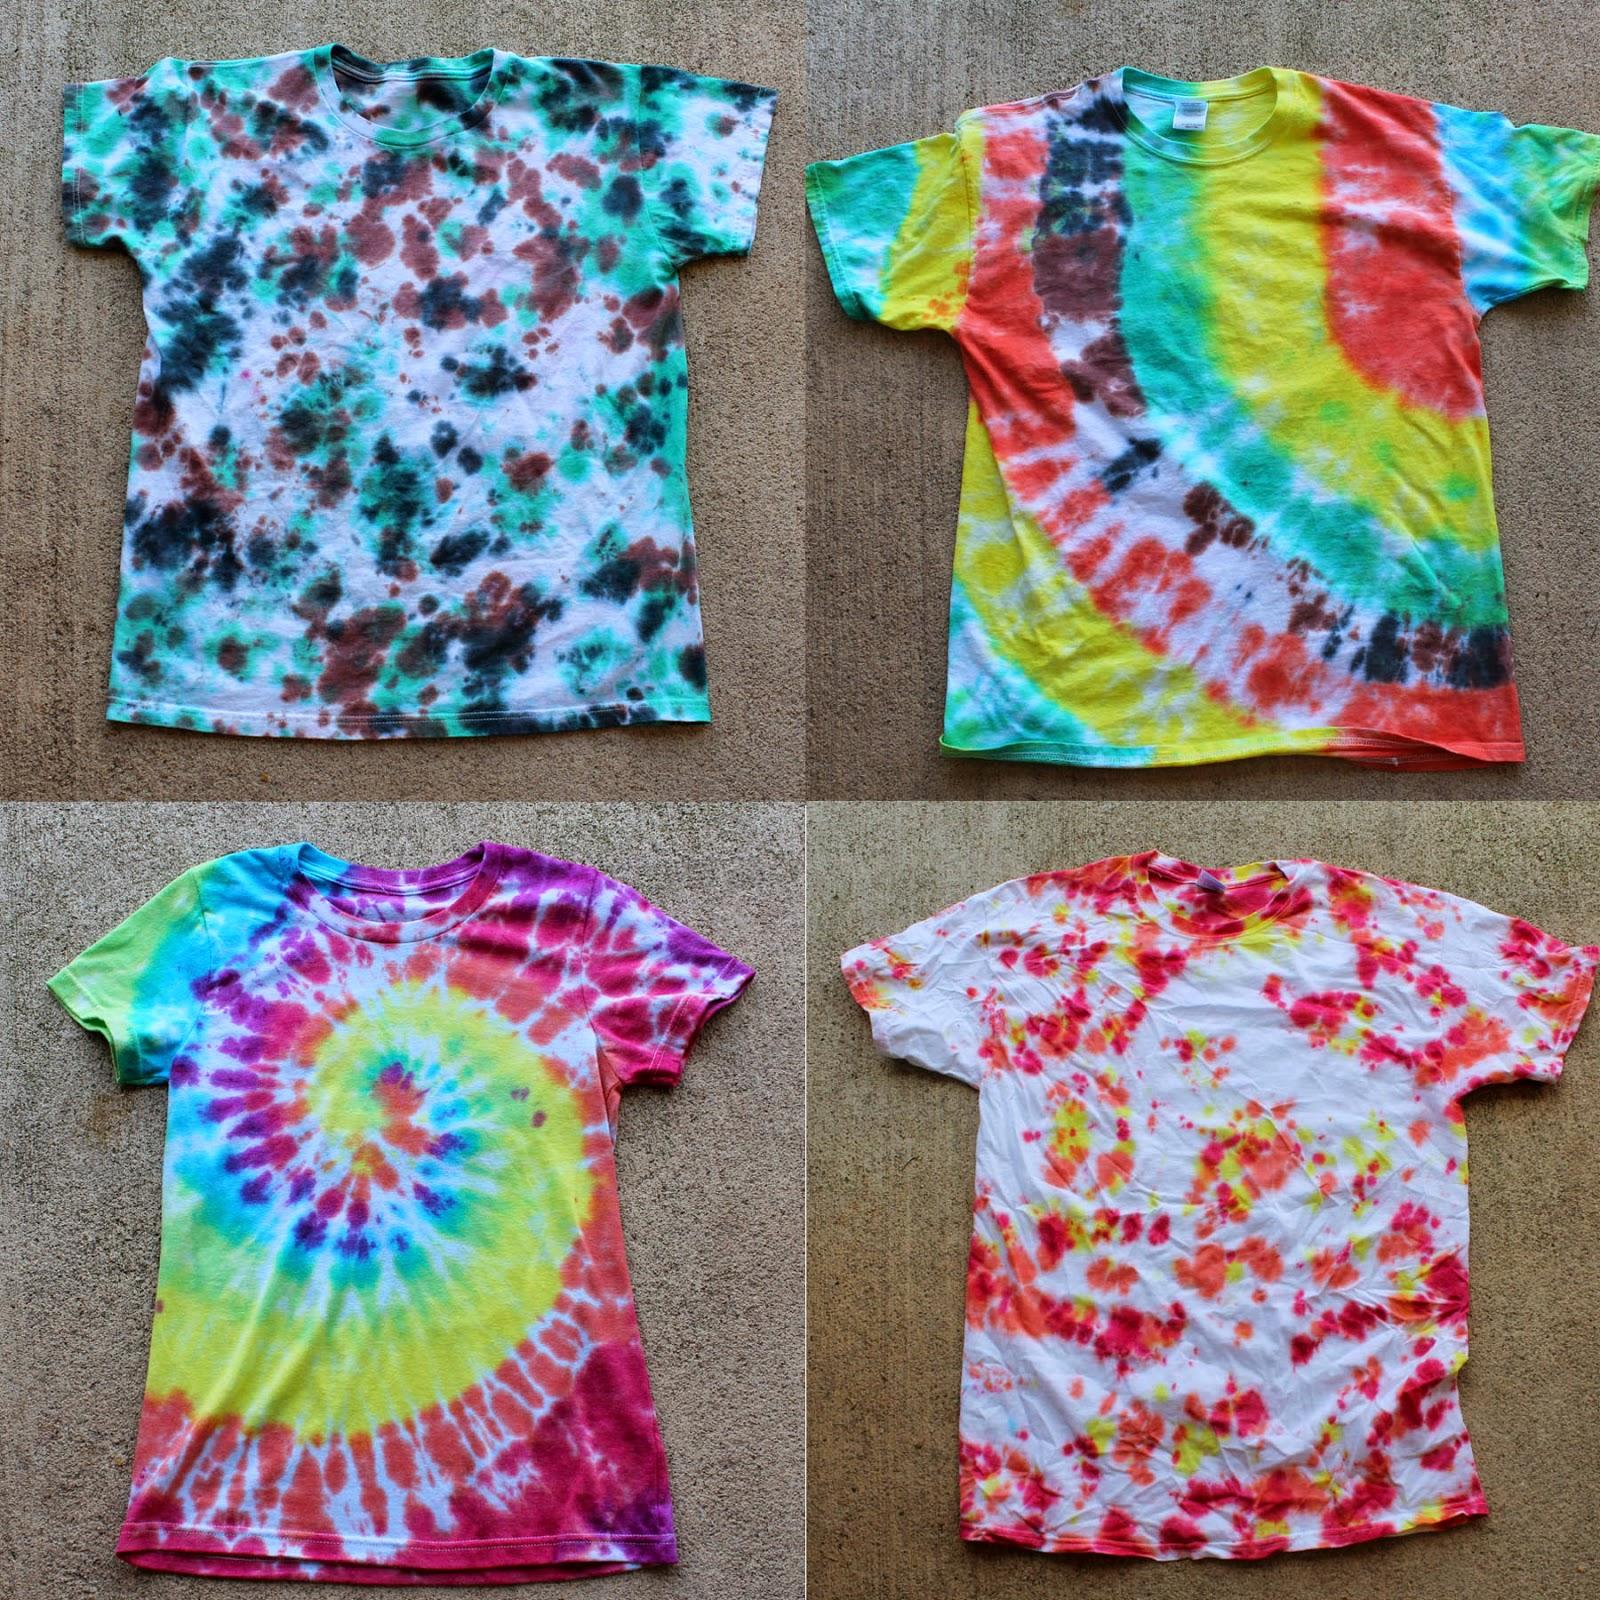 doodlecraft tulip tie dye t shirt